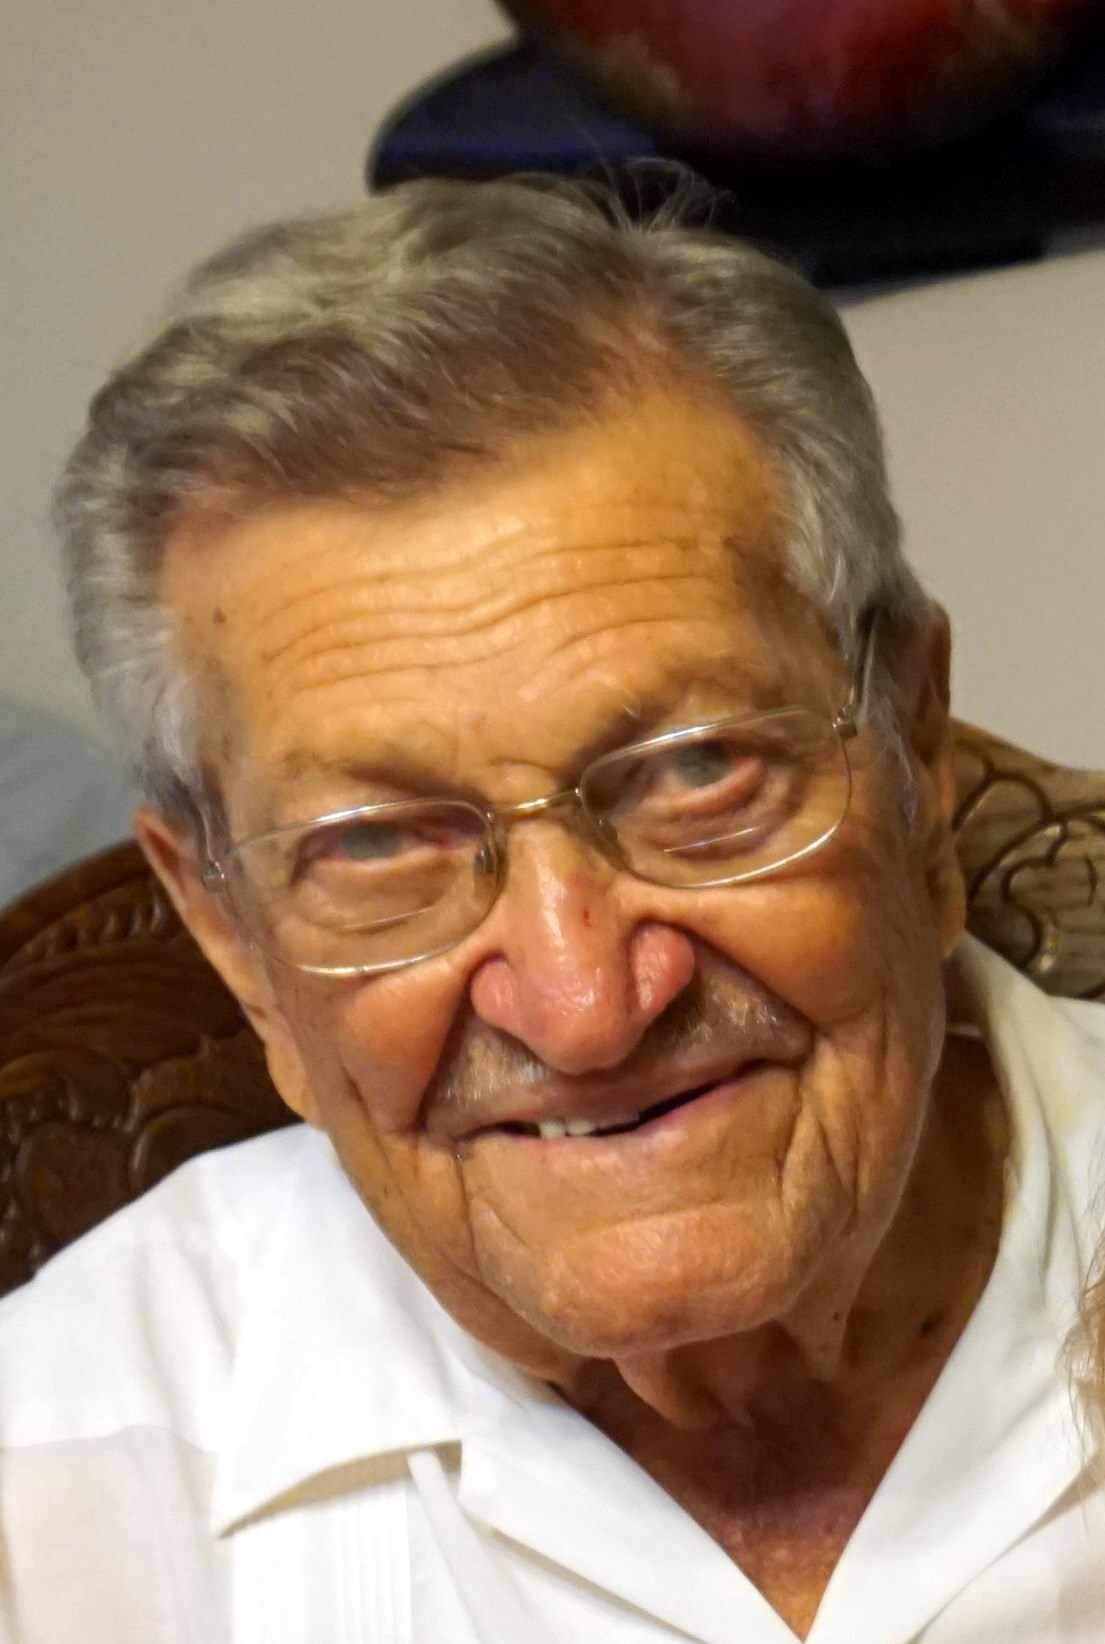 Hudson tee hernandez sr obituary chalmette la - St bernard memorial gardens obituaries ...